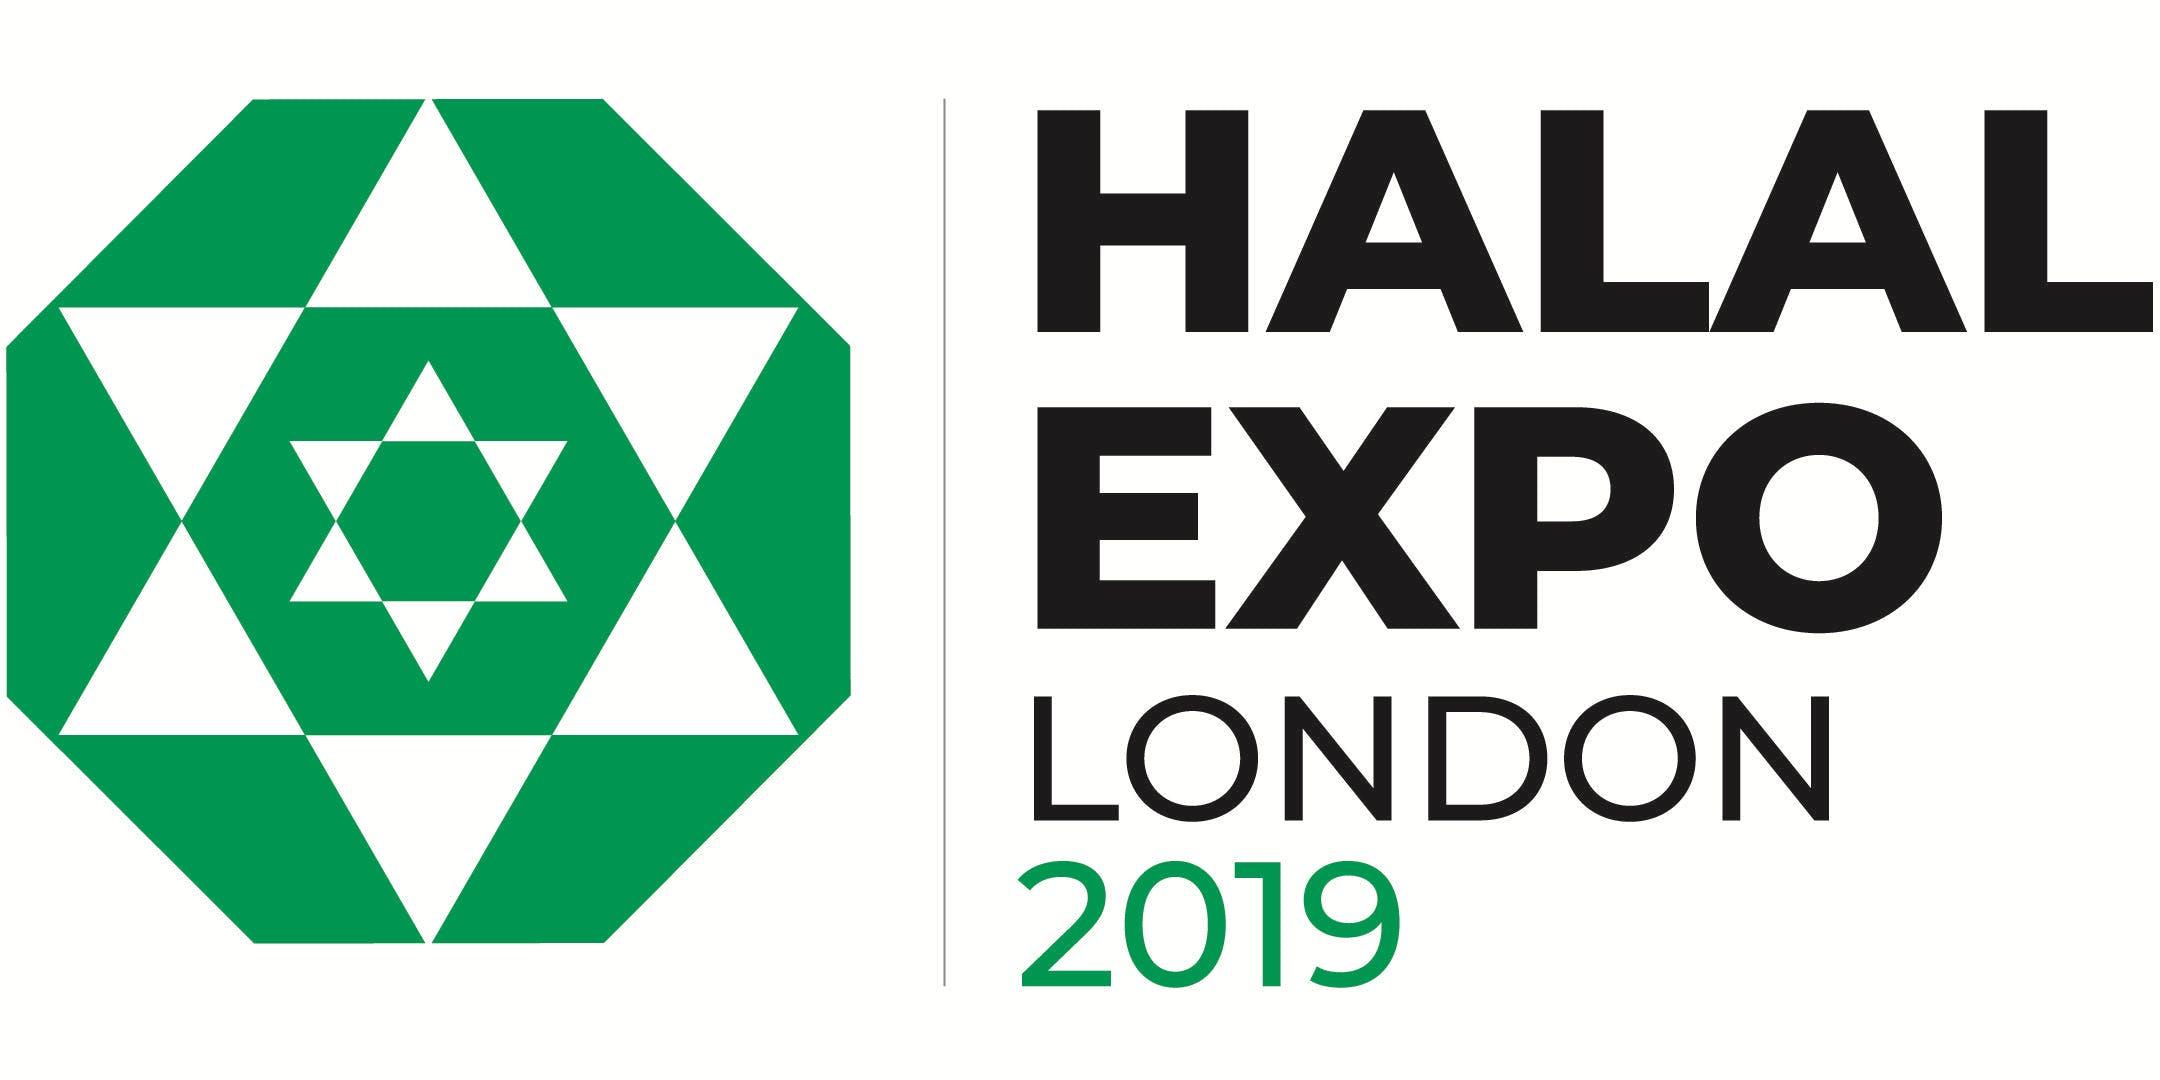 HALAL EXPO LONDON 2019